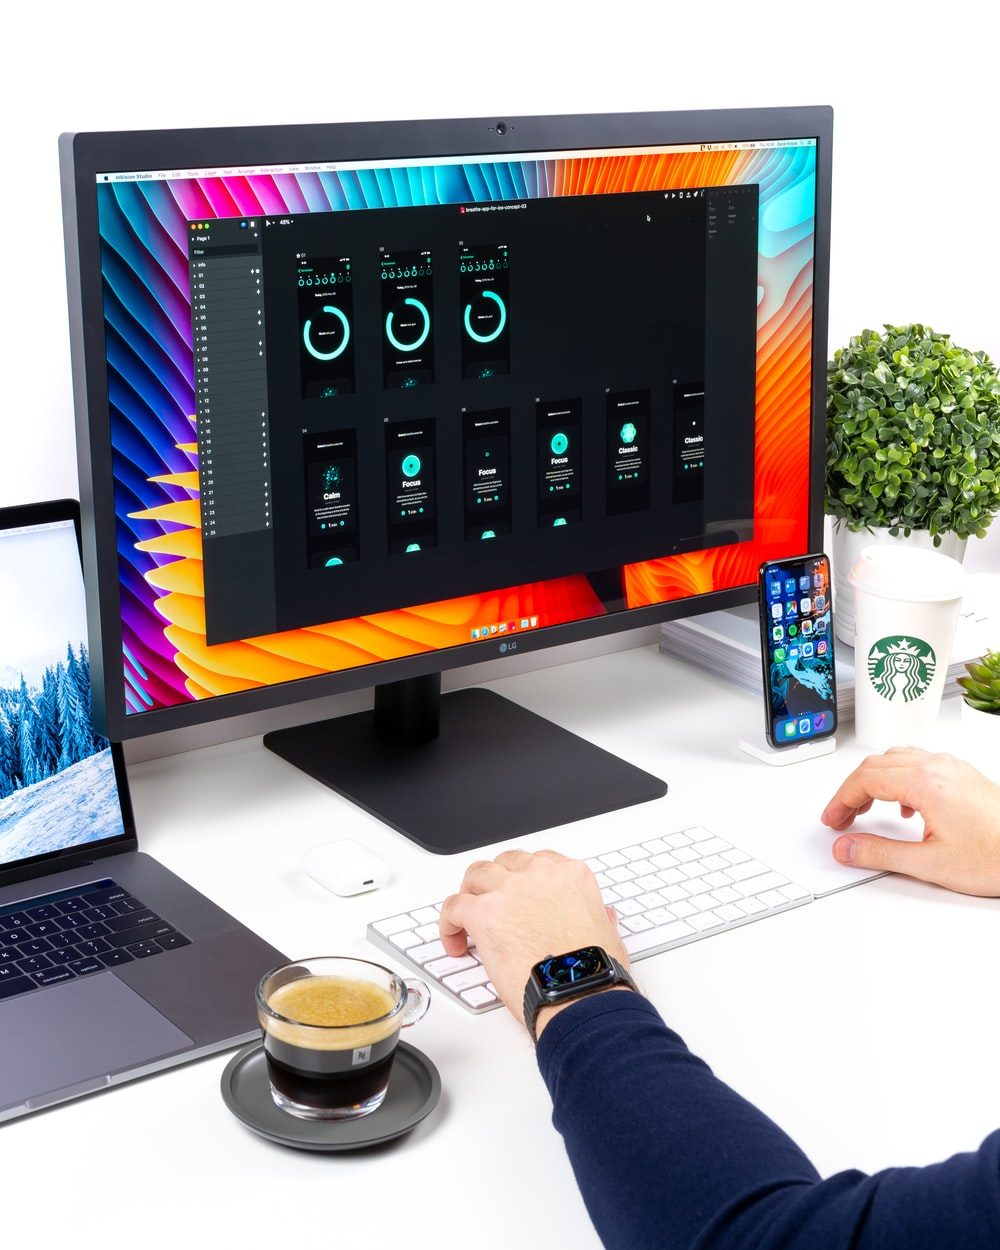 flat screen computer monitor displaying internet speed